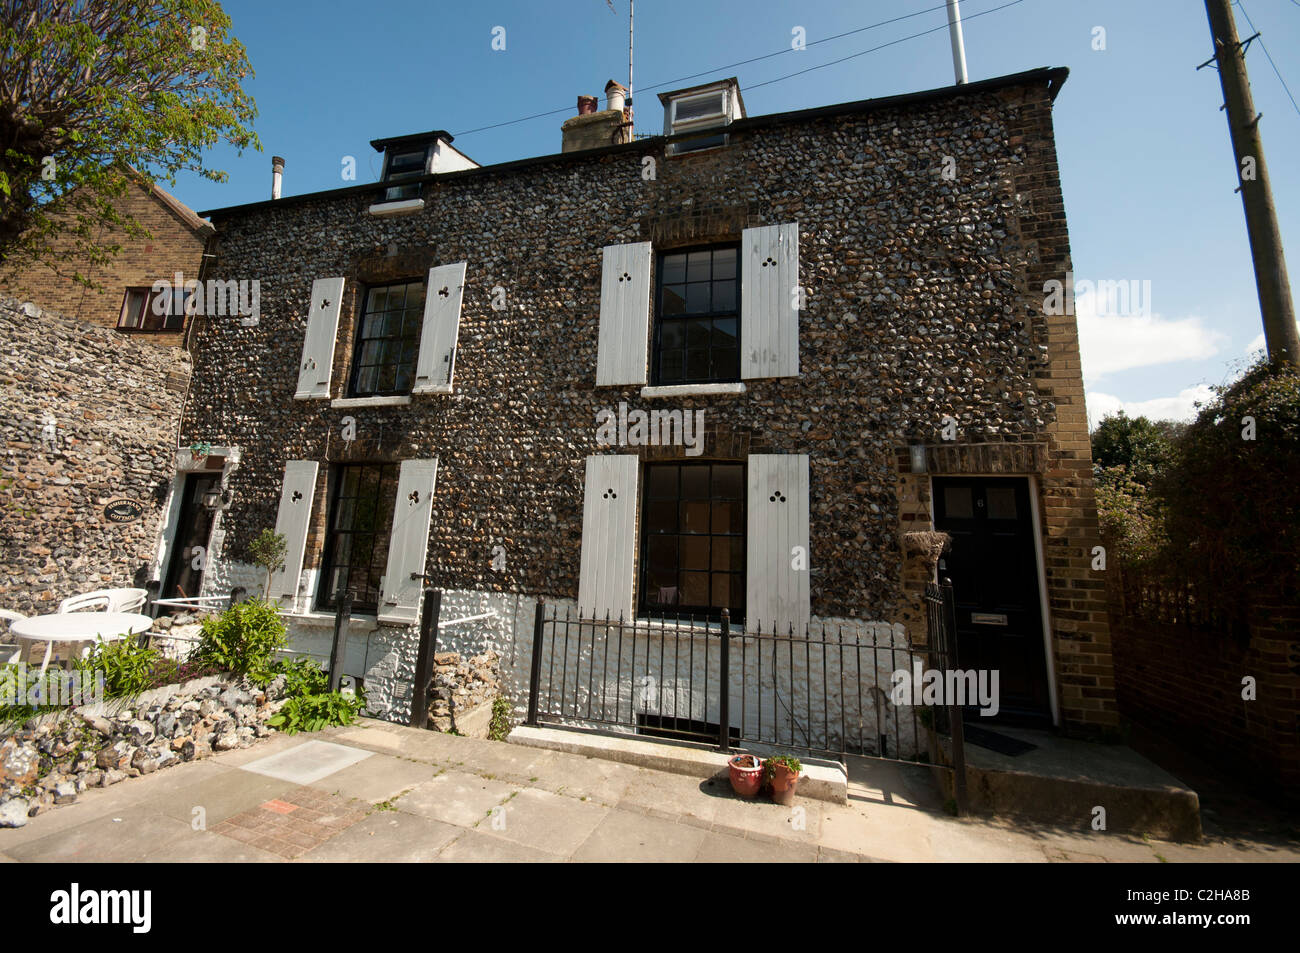 houses broadstairs Kent UK - Stock Image